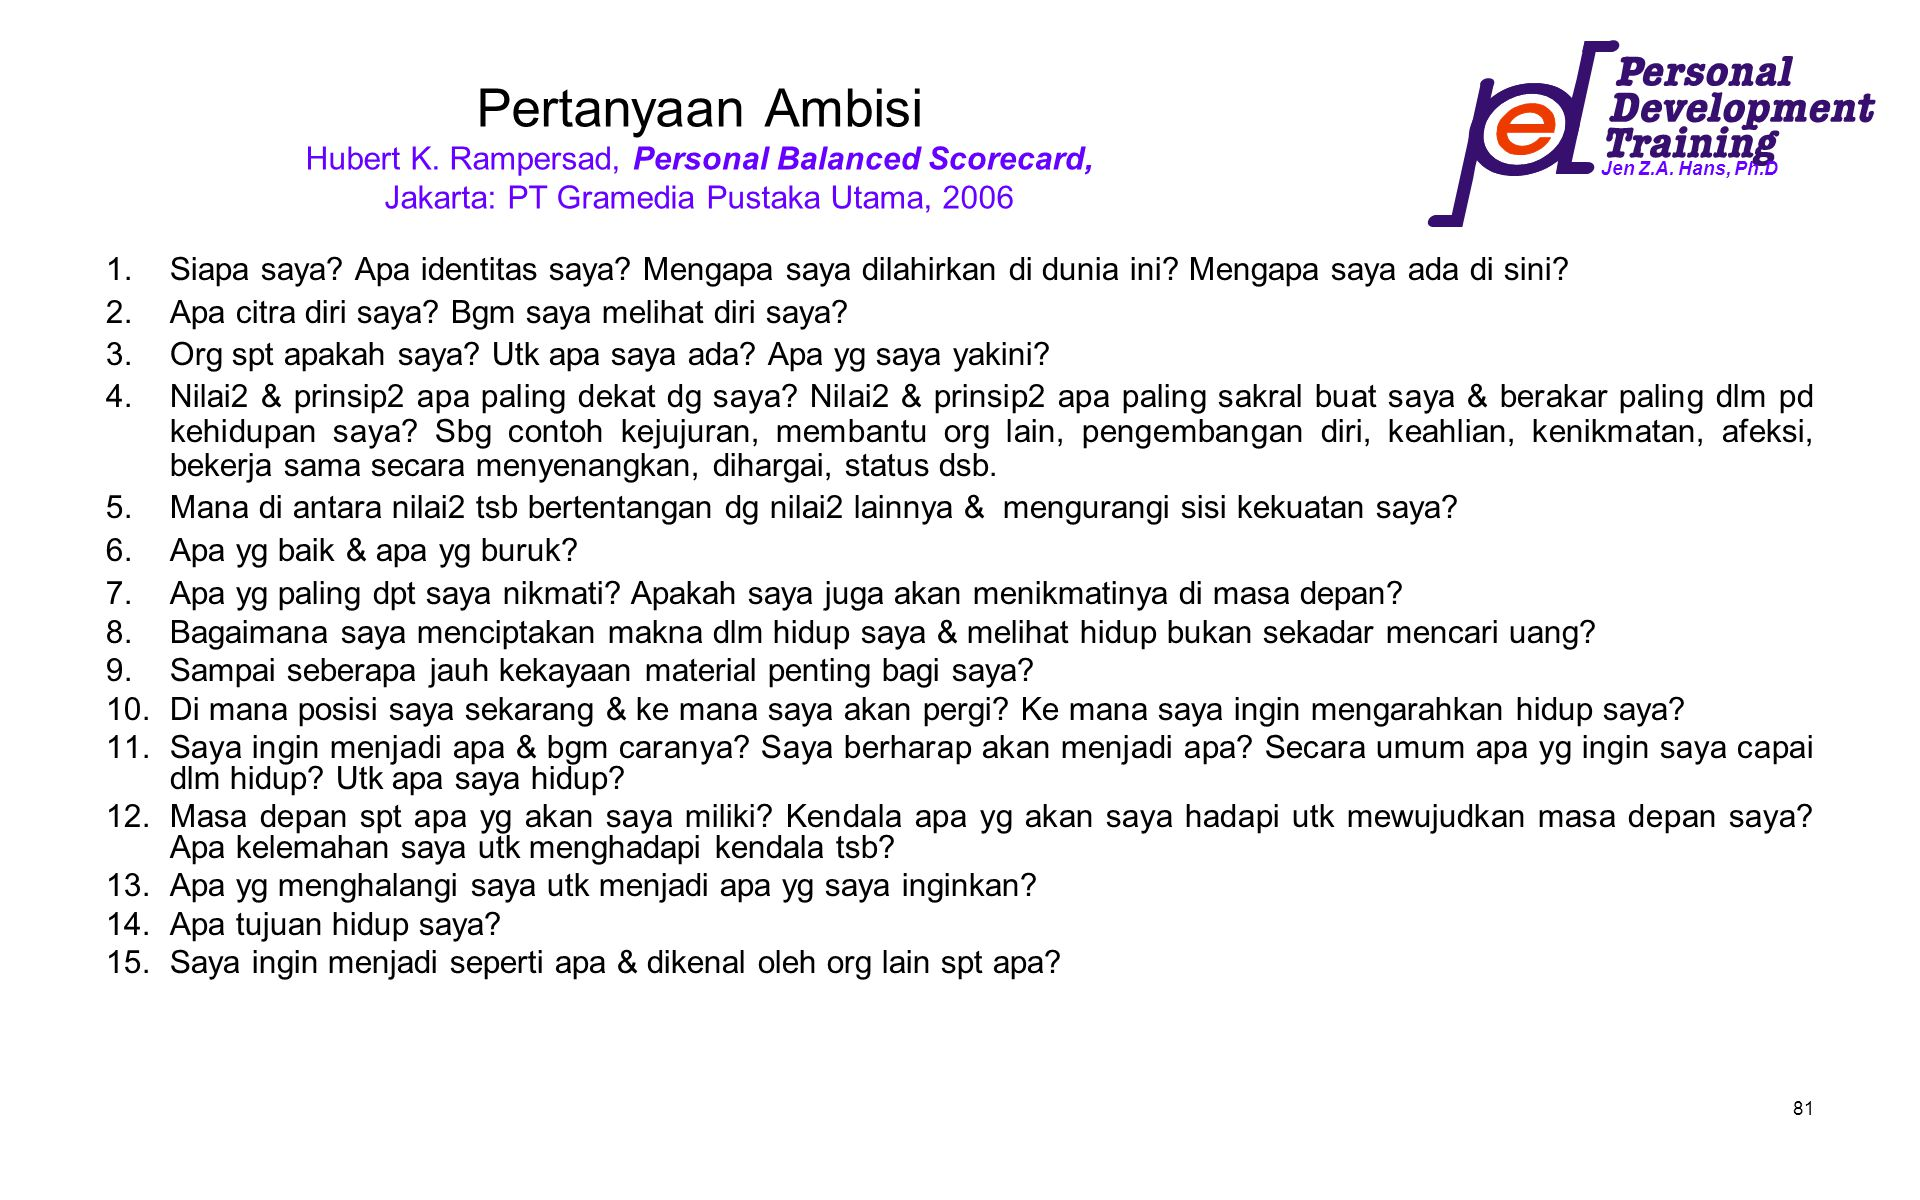 Jen Z.A. Hans, Ph.D 81 Pertanyaan Ambisi Hubert K. Rampersad, Personal Balanced Scorecard, Jakarta: PT Gramedia Pustaka Utama, 2006 1.Siapa saya? Apa